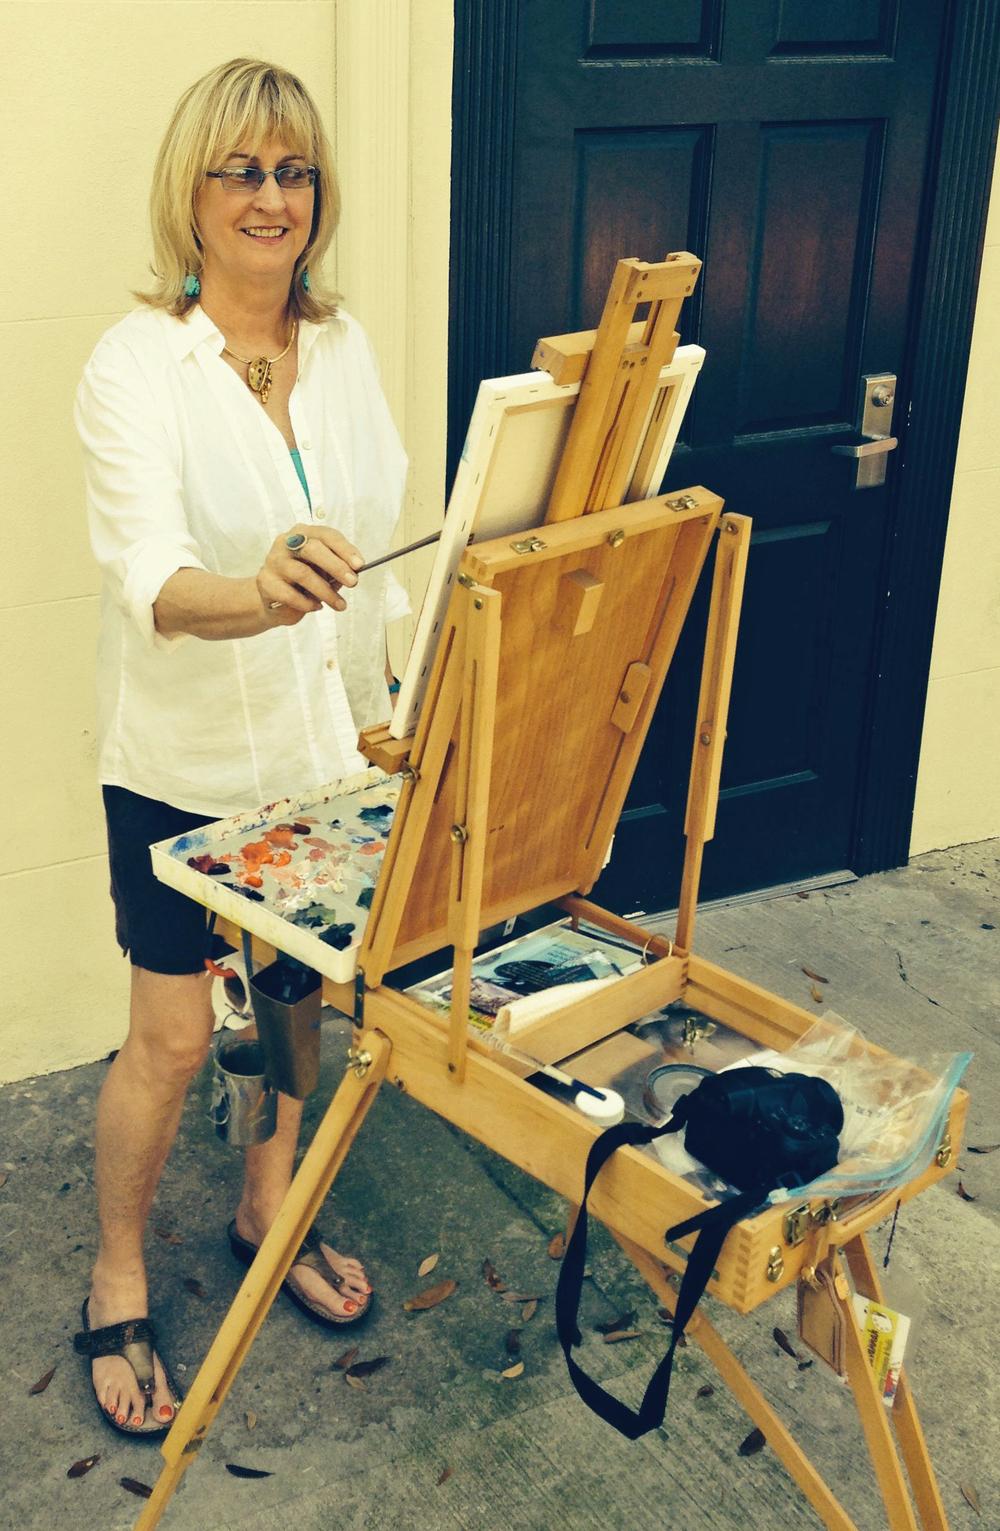 Painting in downtown Savannah